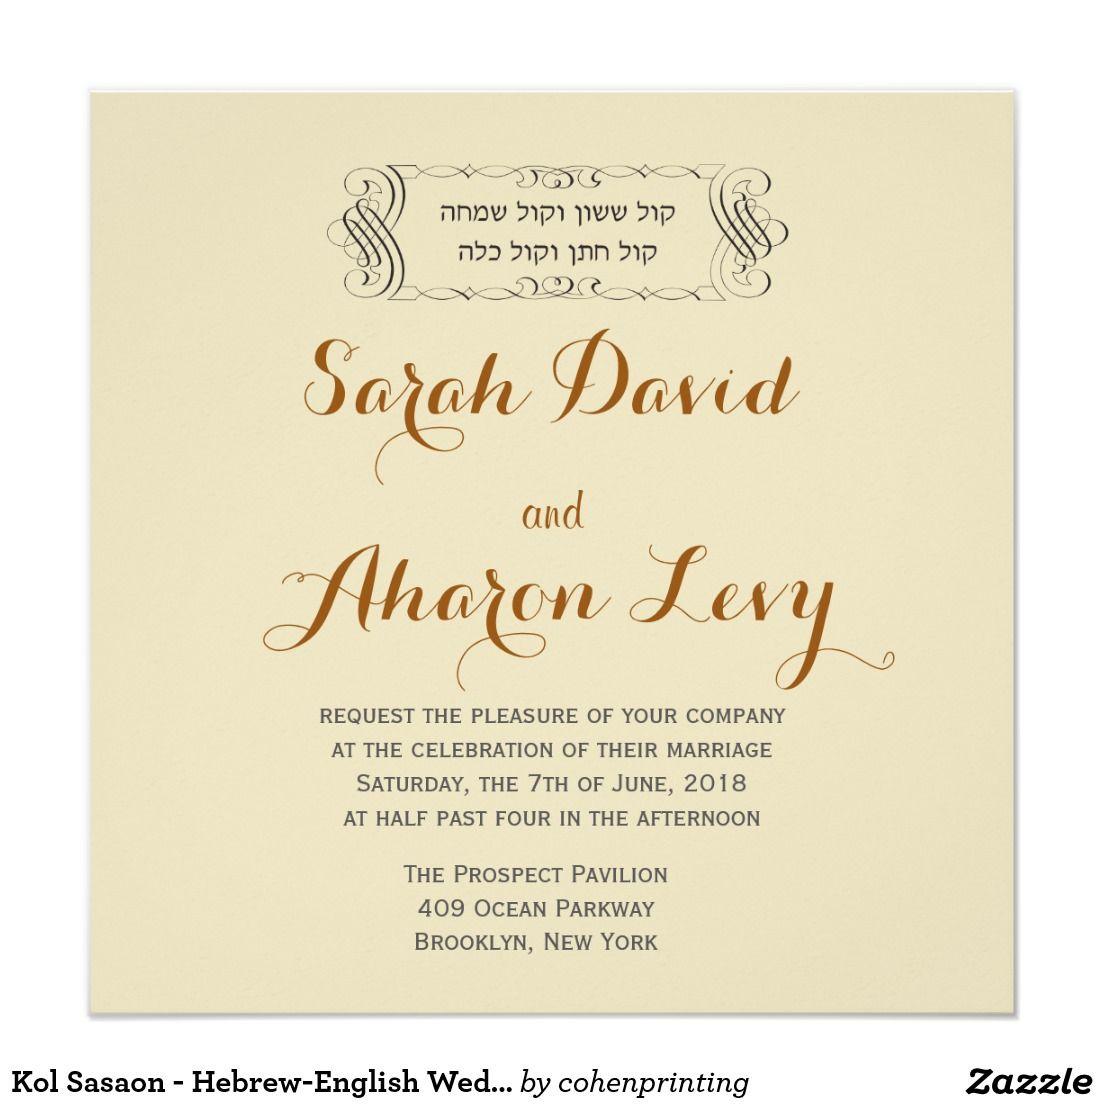 Kol Sasaon - Hebrew-English Wedding Invitation   English and Weddings